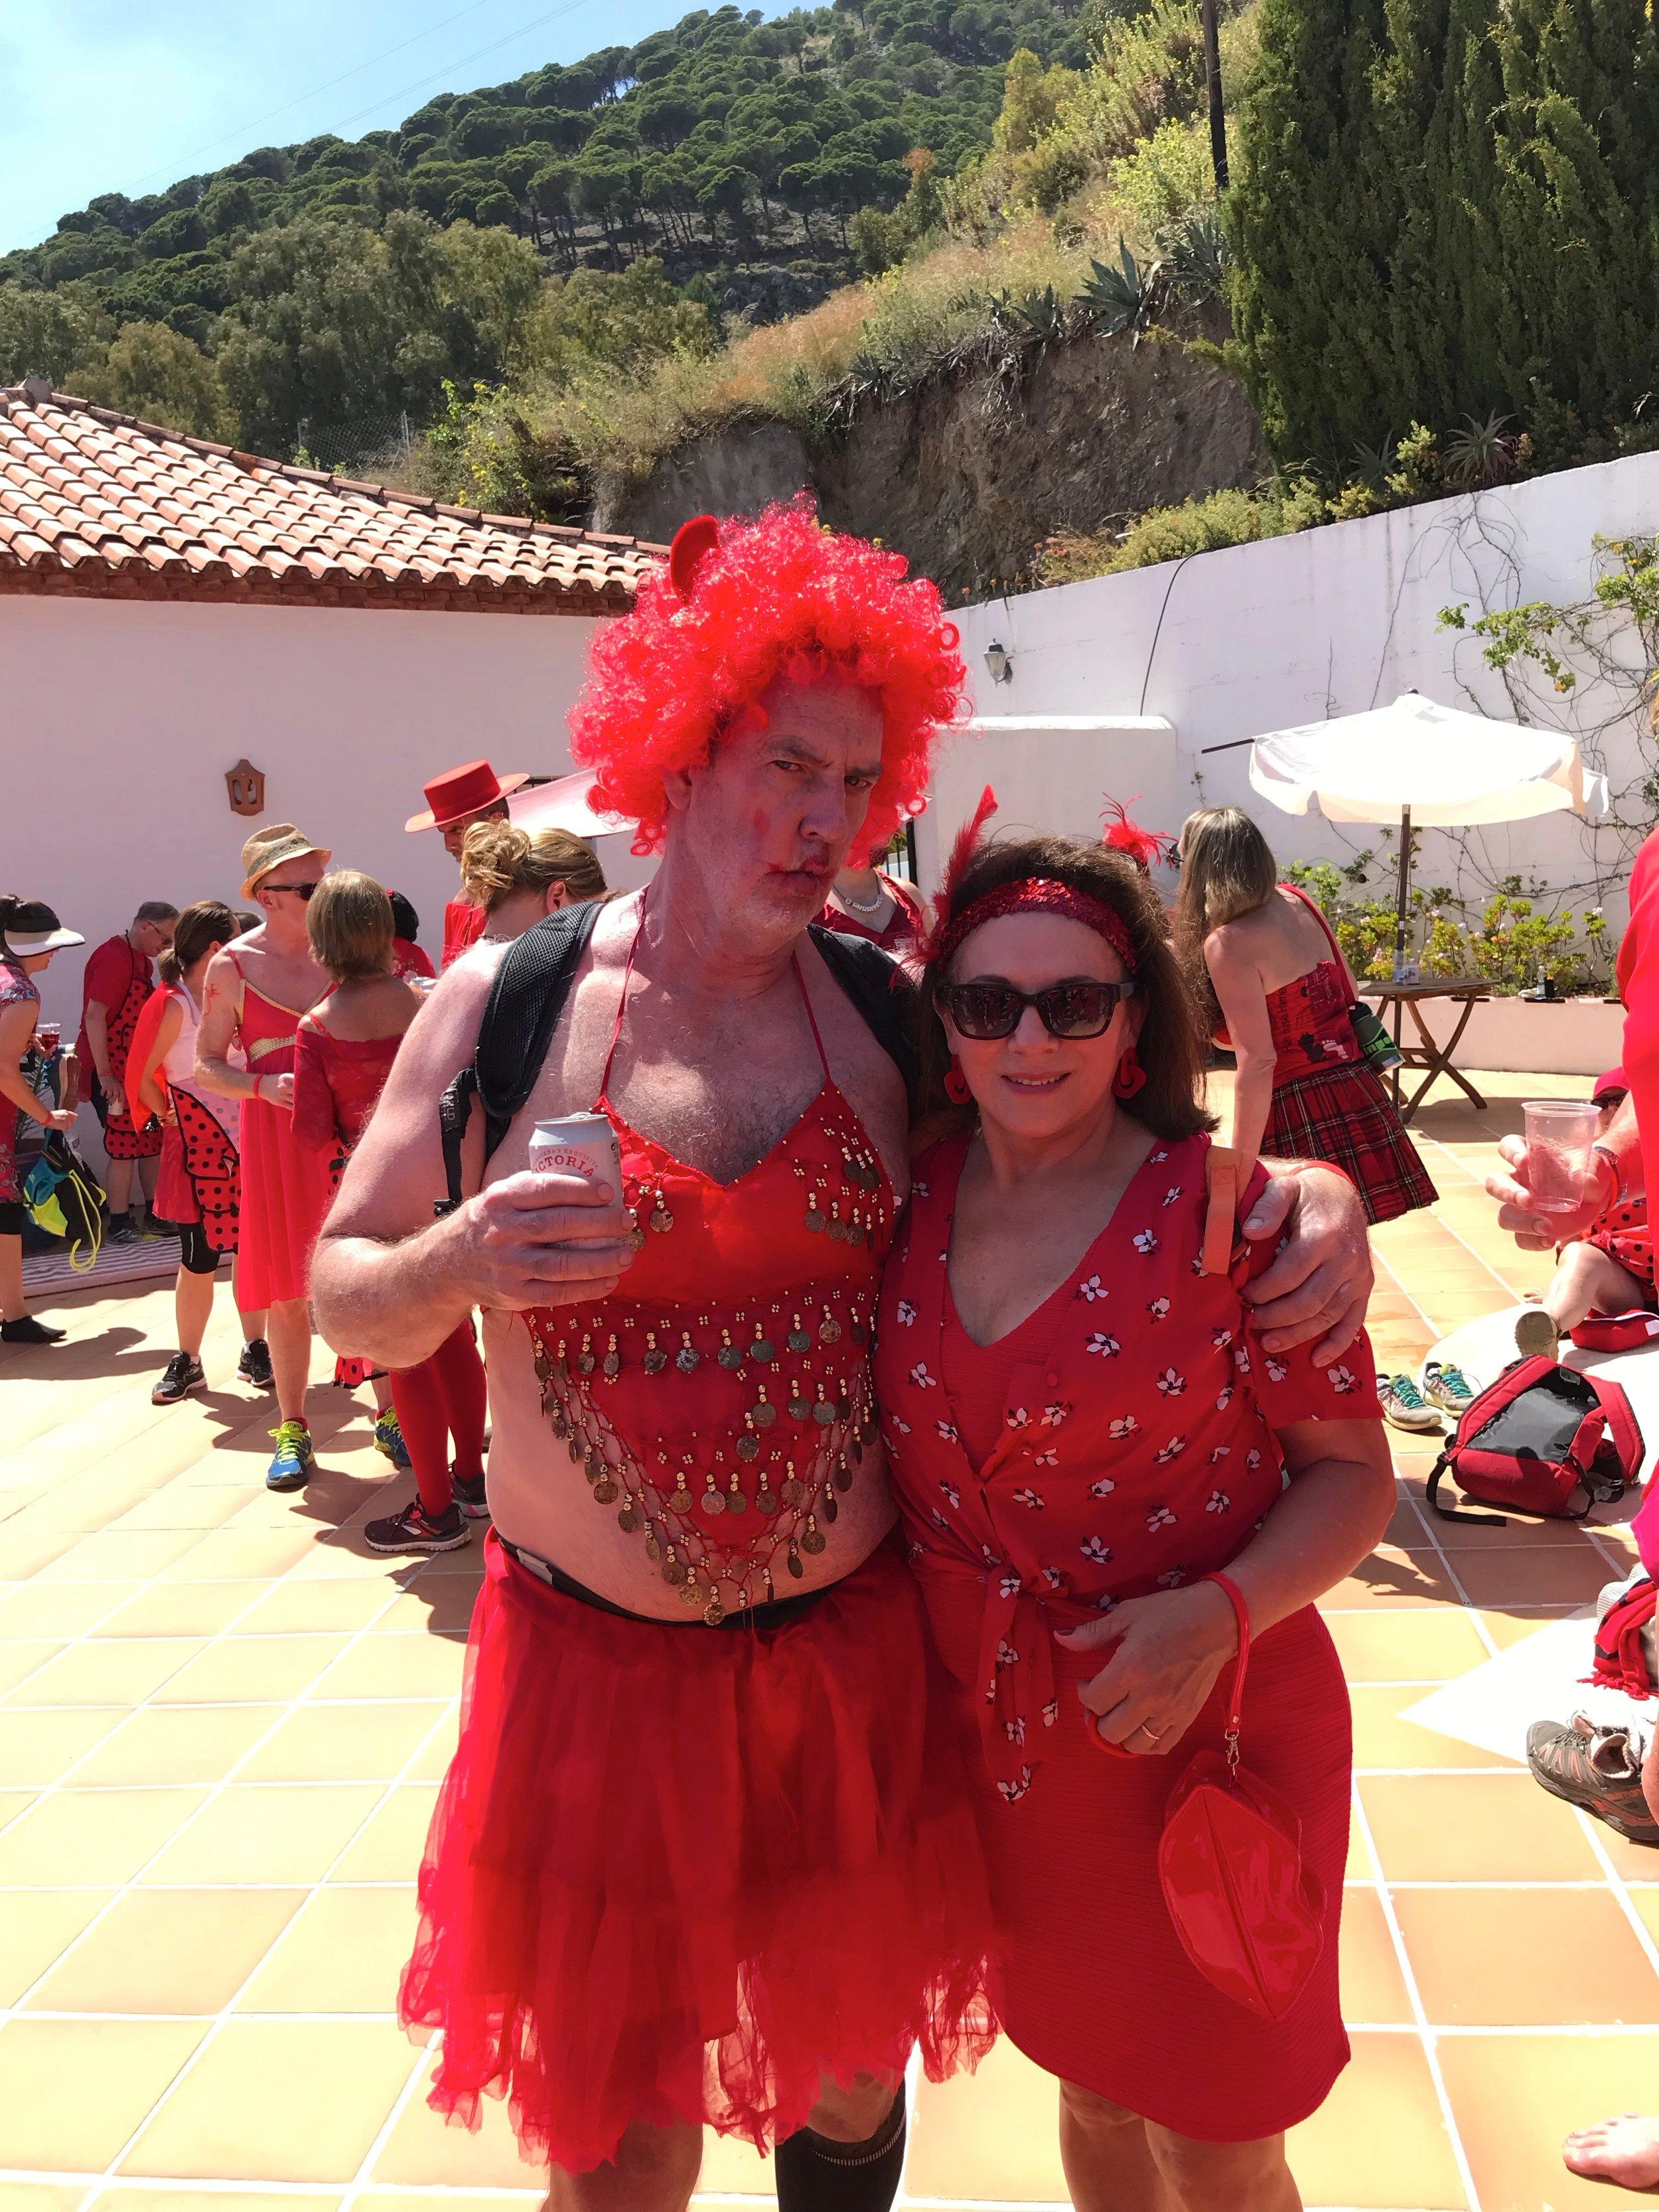 Mijas H3 - Hash Flash Red Hot Chili - 30th Ann. Red Dress Run 1631  - 16 May 2019 - Photo8.jpg